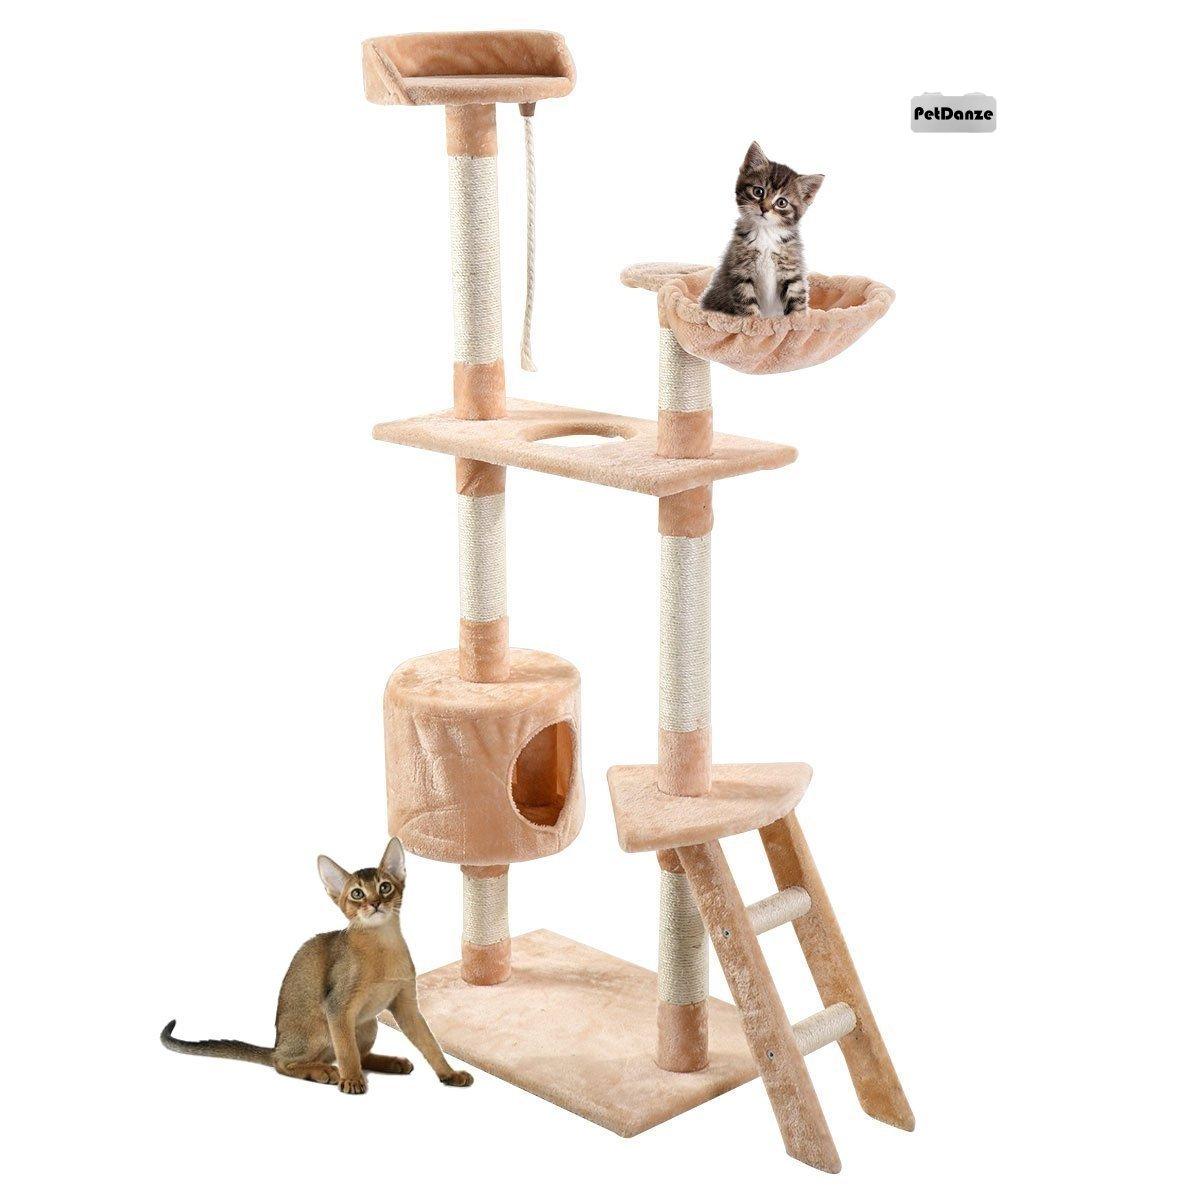 PetDanze Cat Tree Kitten Condo Post Scratcher | Kitty Tower Scratching Post Furniture | Cat Climbers Play House | 60'' Height, Beige